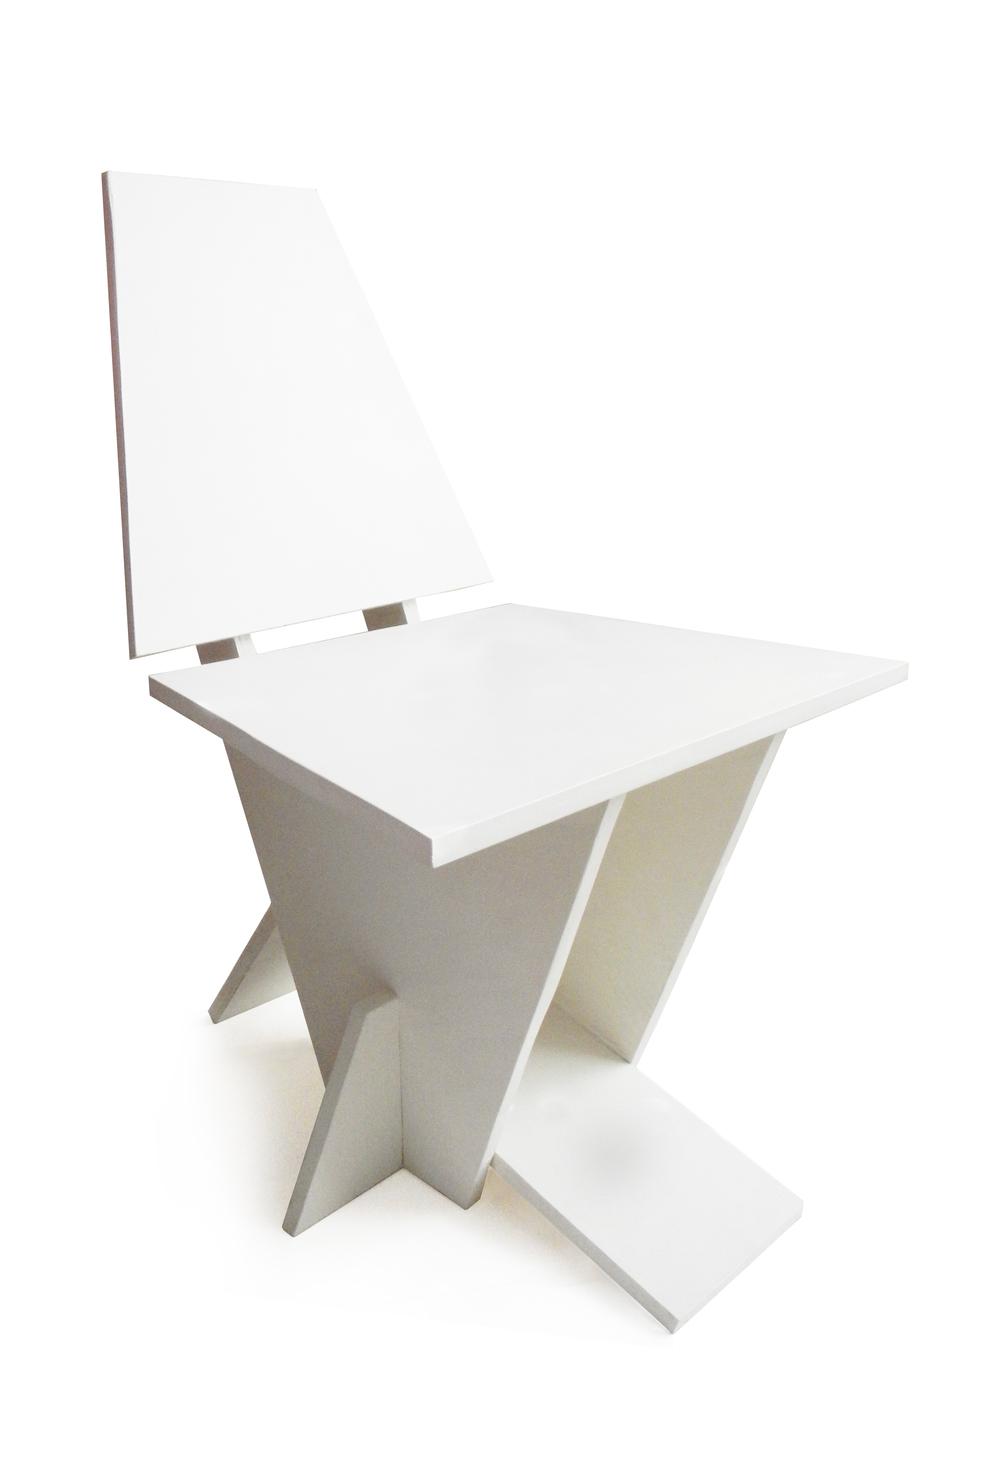 Glick_Ryan_Dining Chair 1.2_©